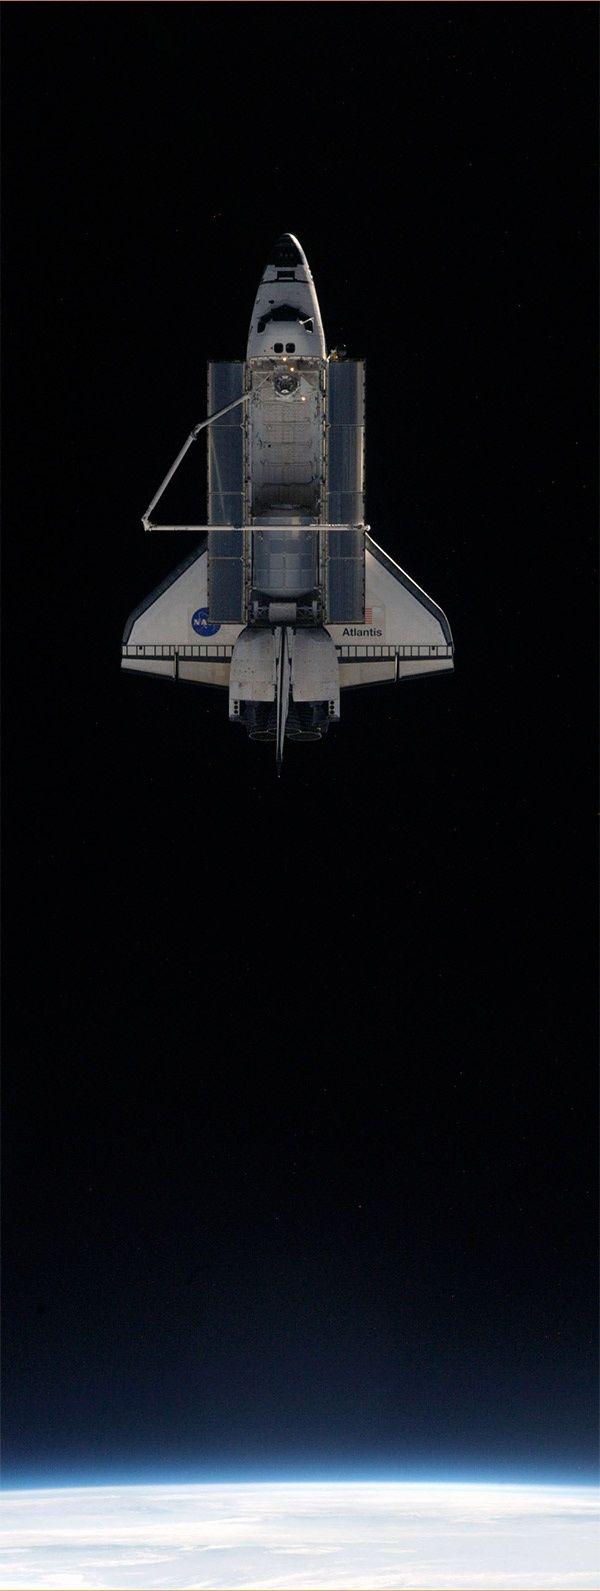 Atlantis in the orbit, cargo bay open.